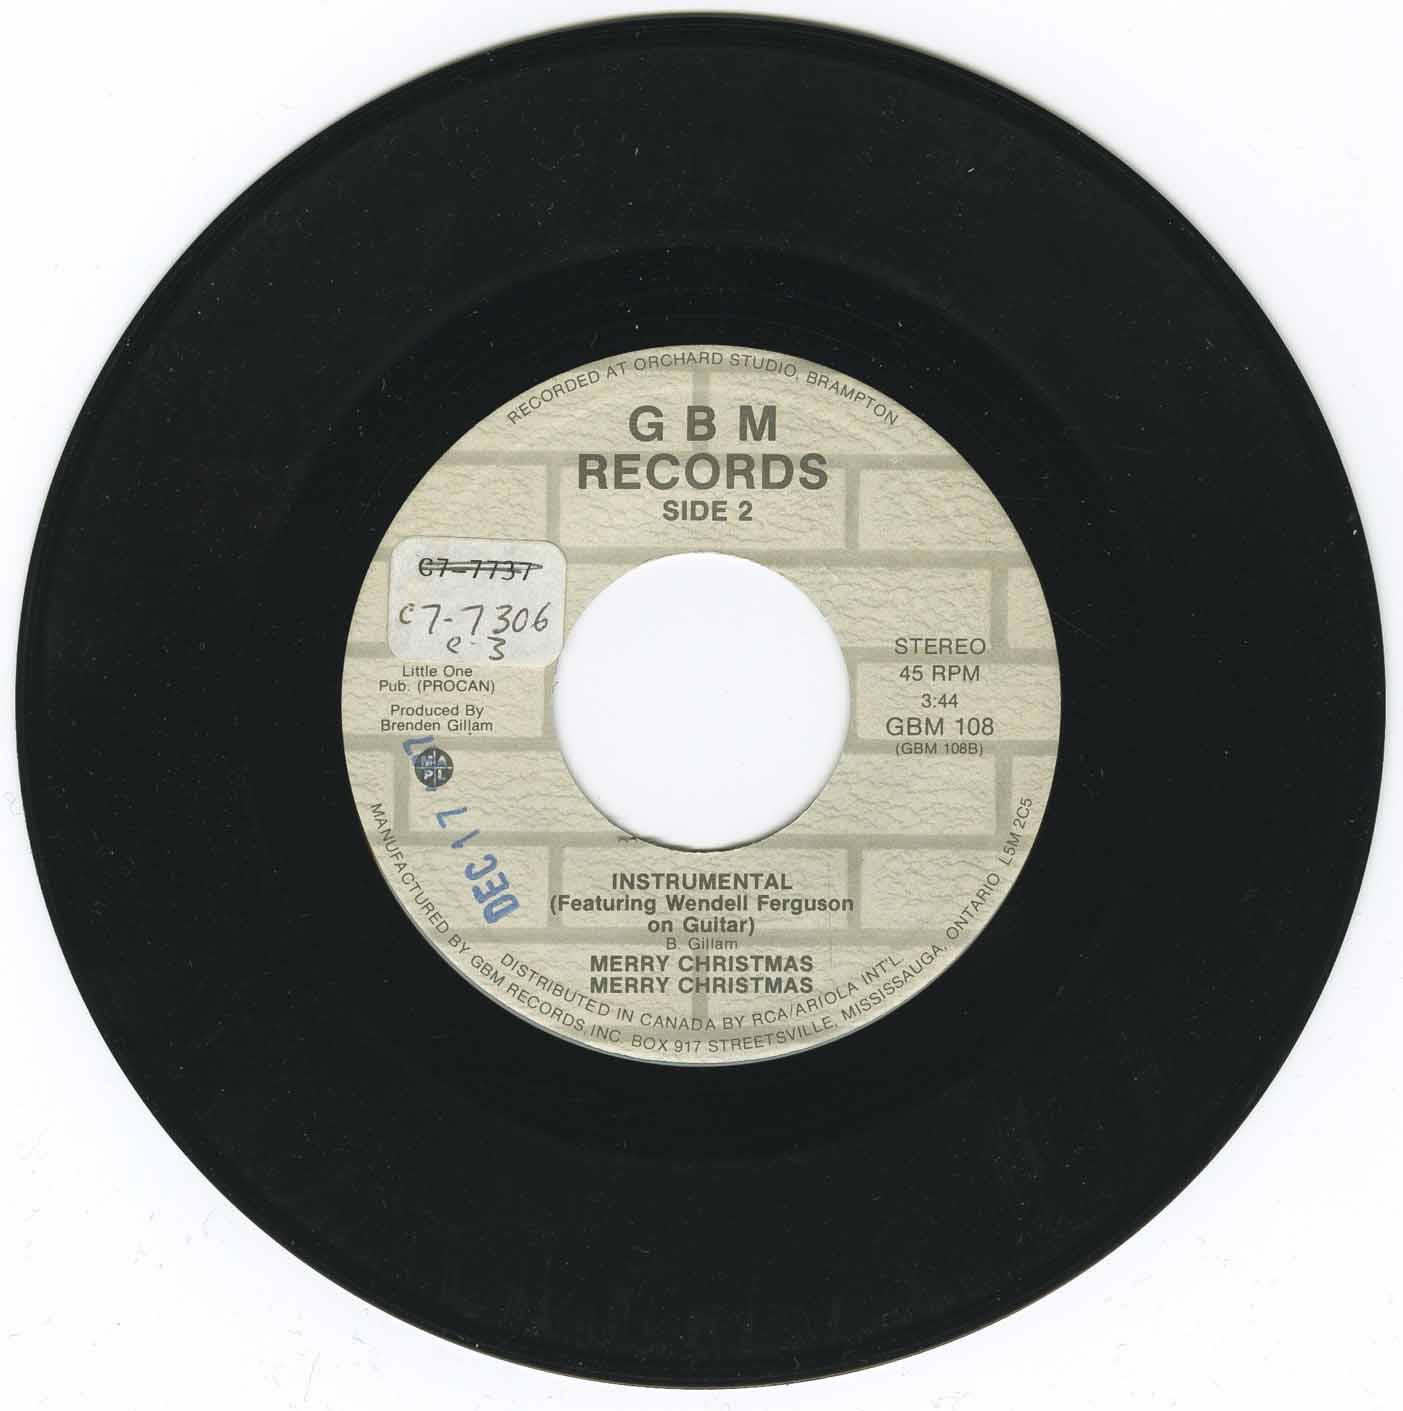 Gillam, Brenden - Merry Christmas b/w Merry Christmas (Instrumental)